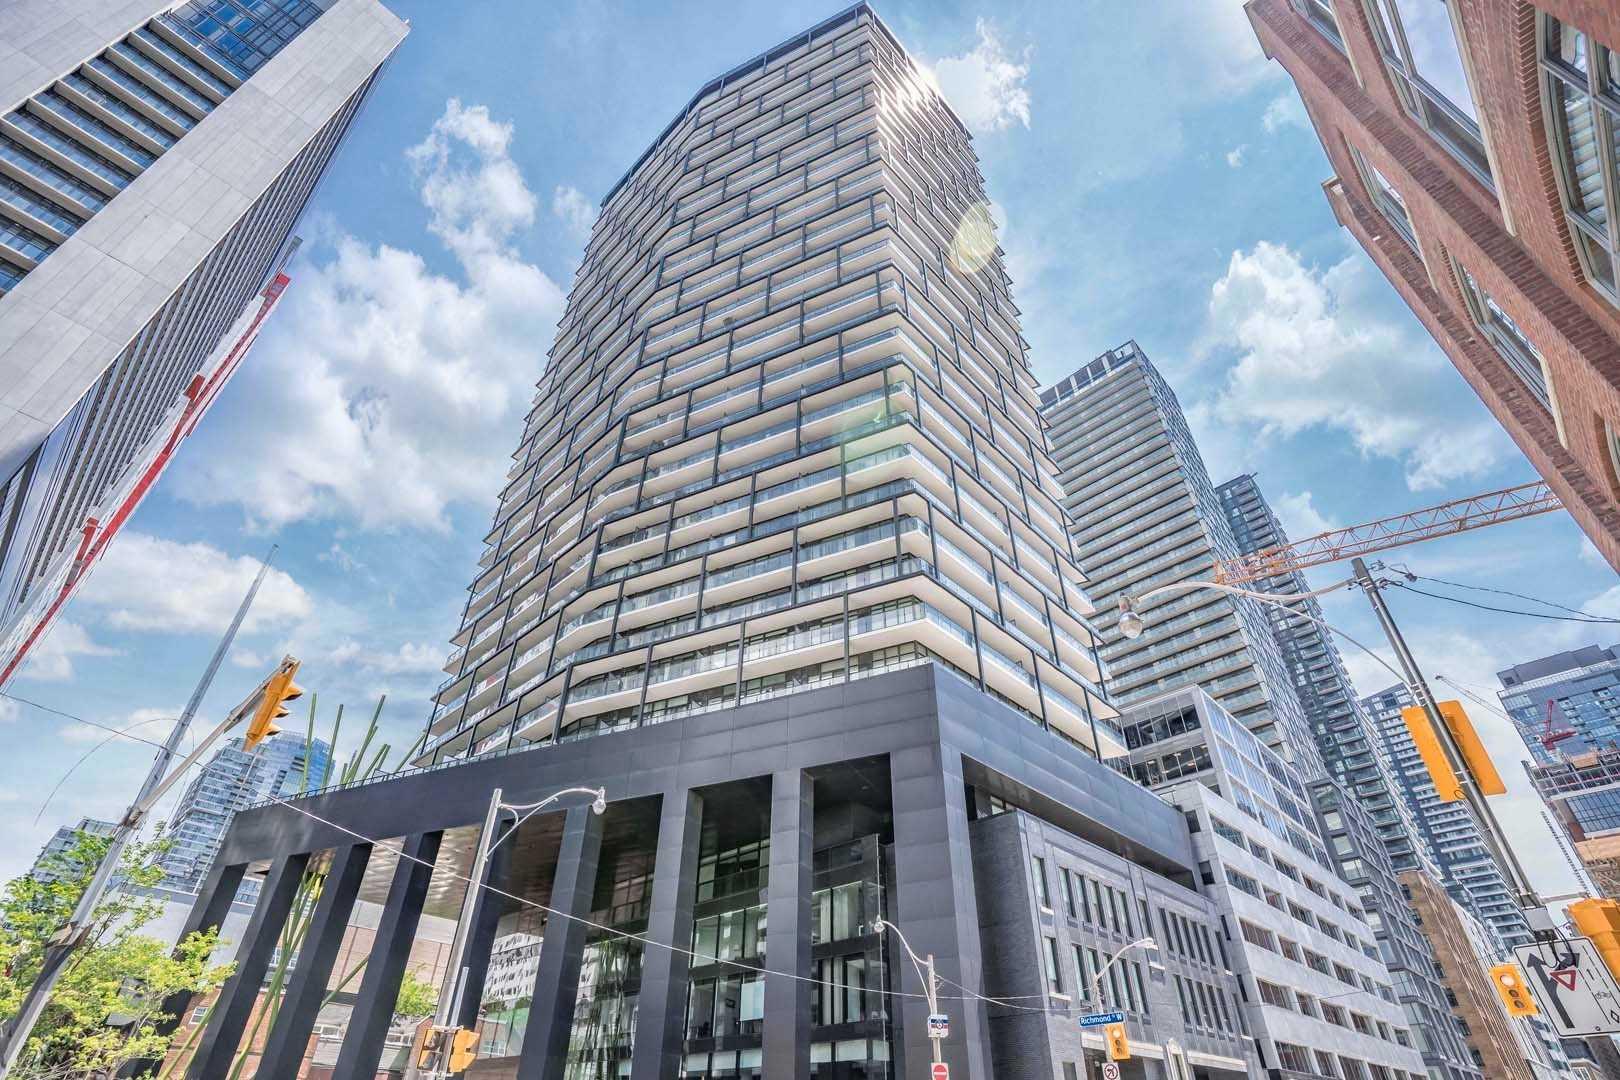 House For Sale Unit 3312, 125 Peter St, M5V0M2, Waterfront Communities C1, Toronto